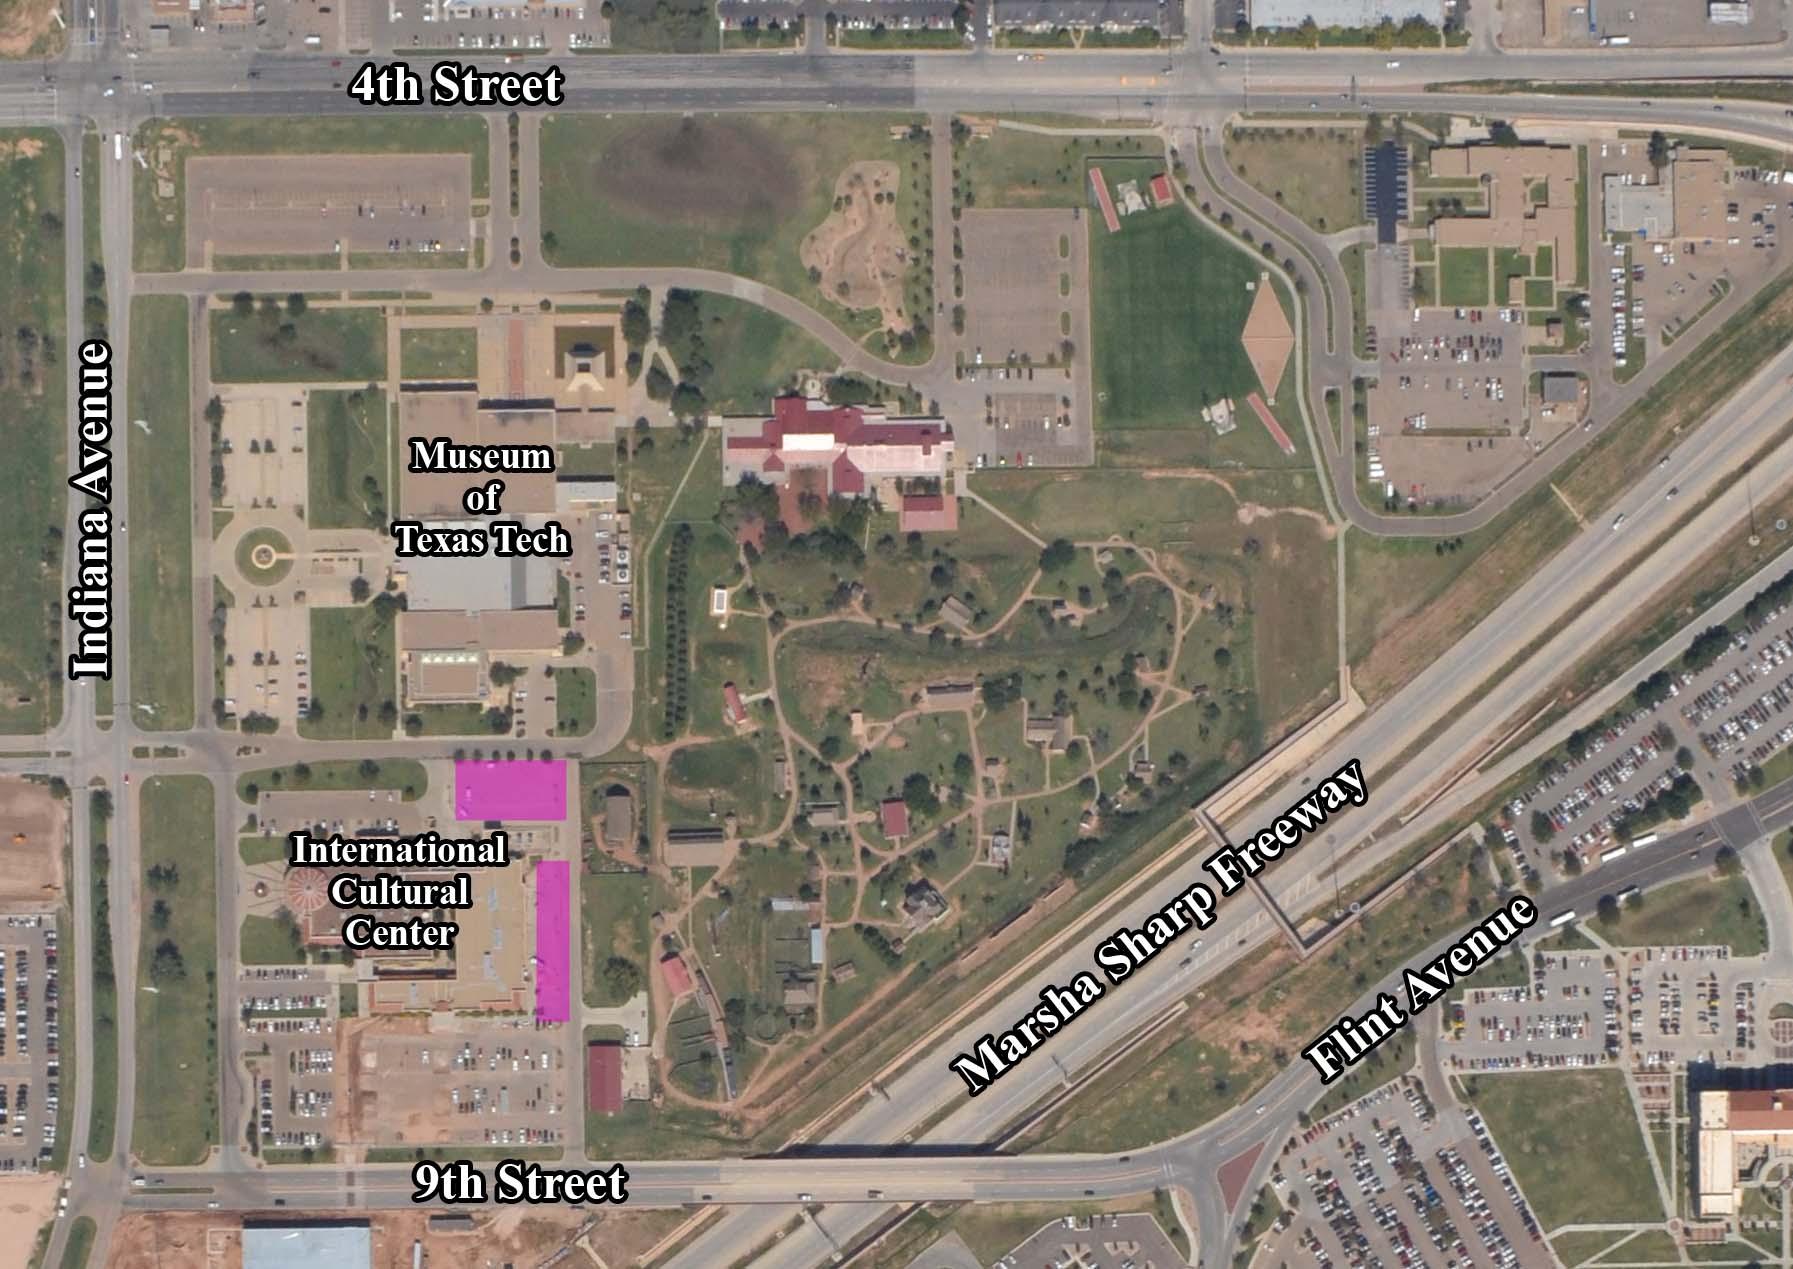 Campus Maps | Transportation & Parking Services | Ttu - Texas Tech Campus Map